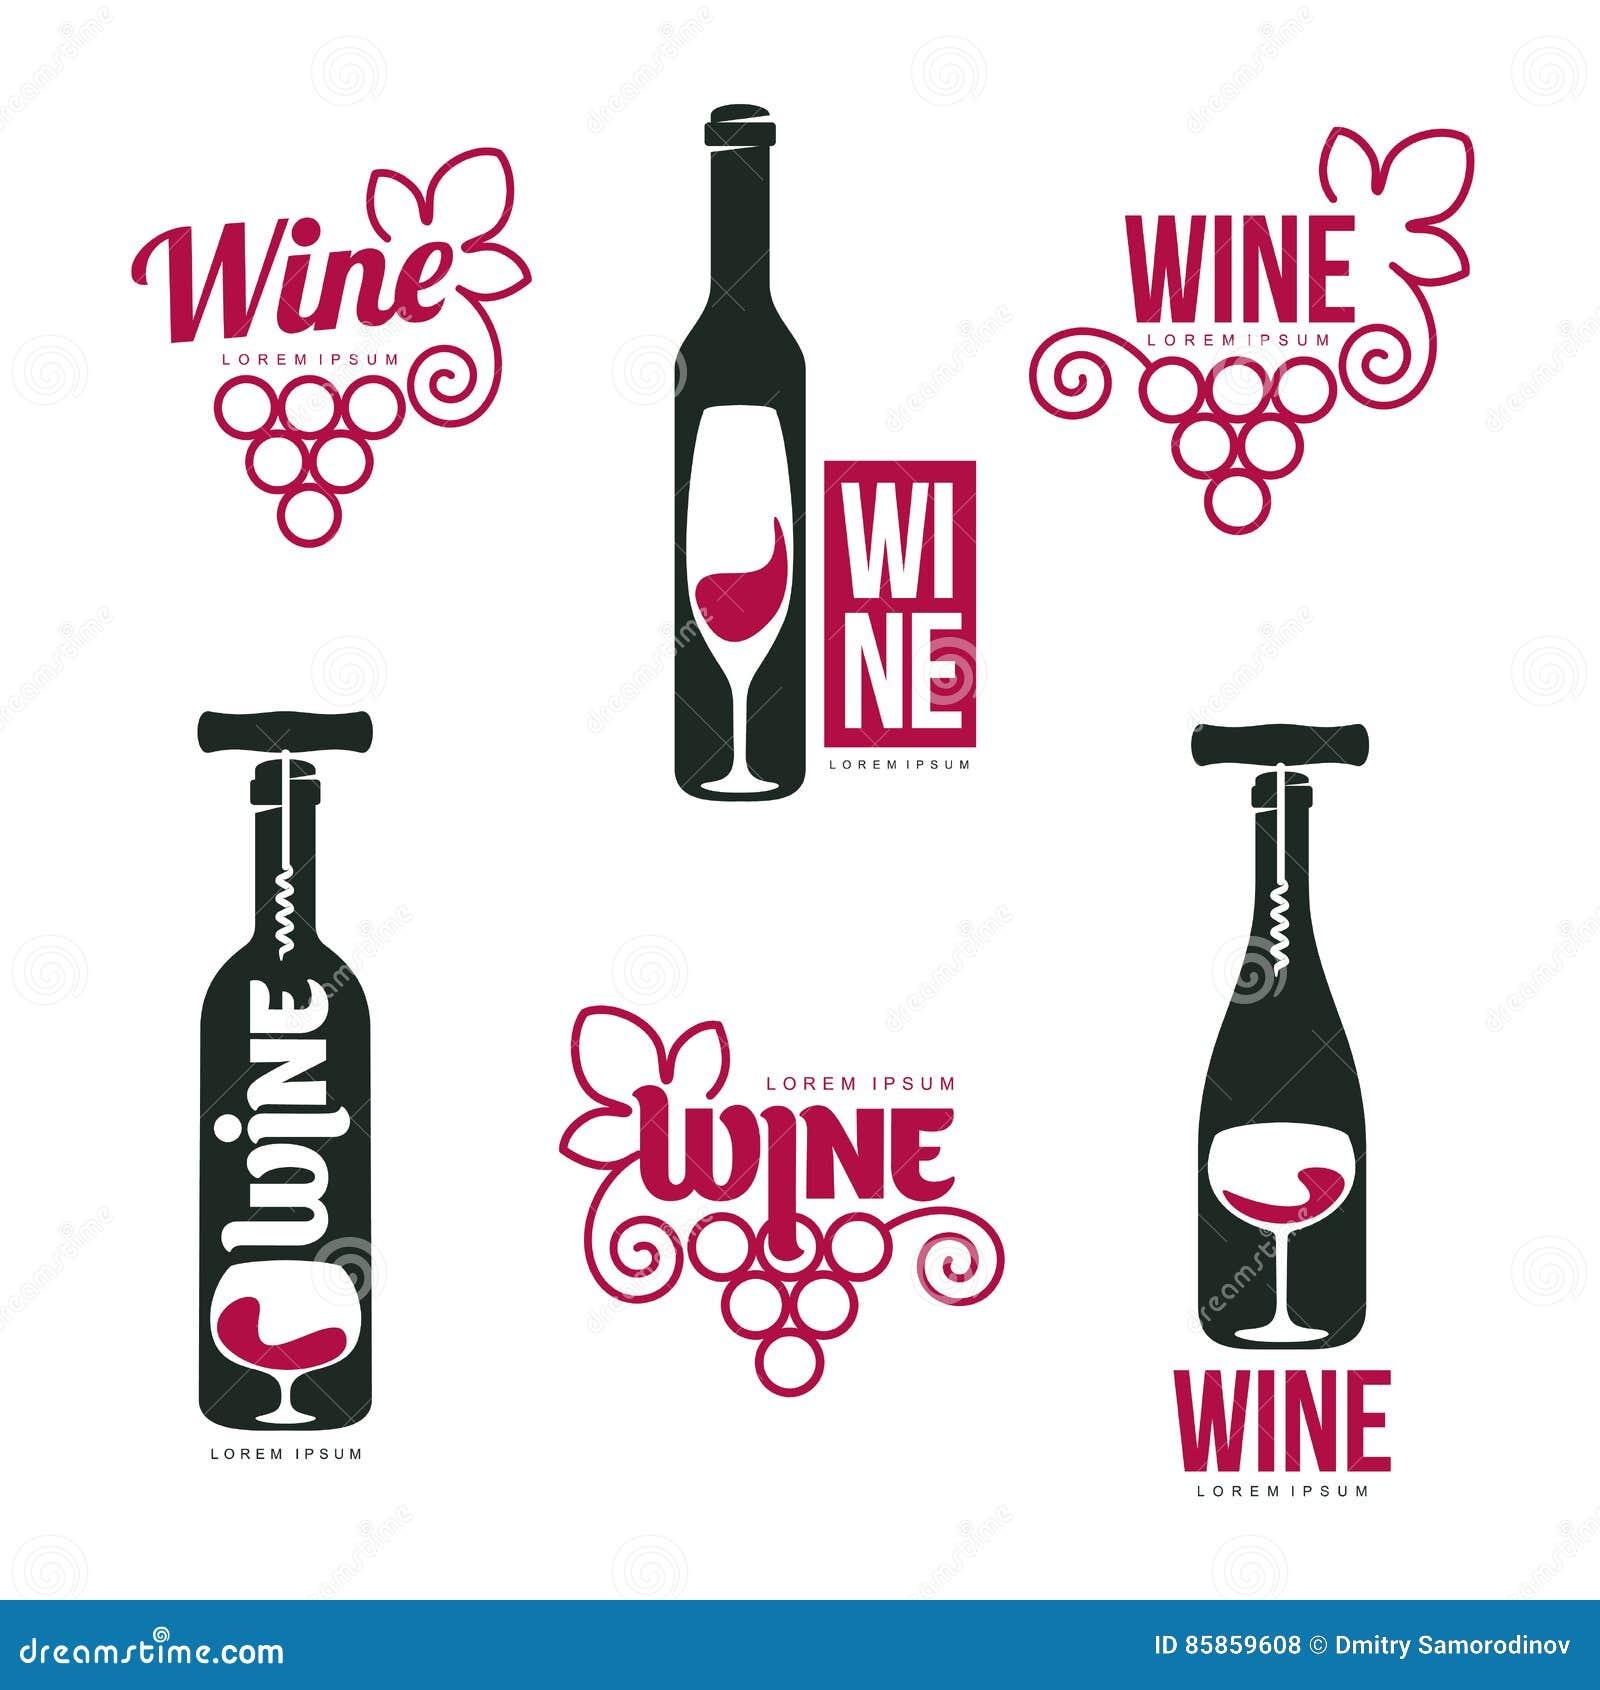 Wine Tag Template Wine Bottle Label Templates Download Wine Bottle